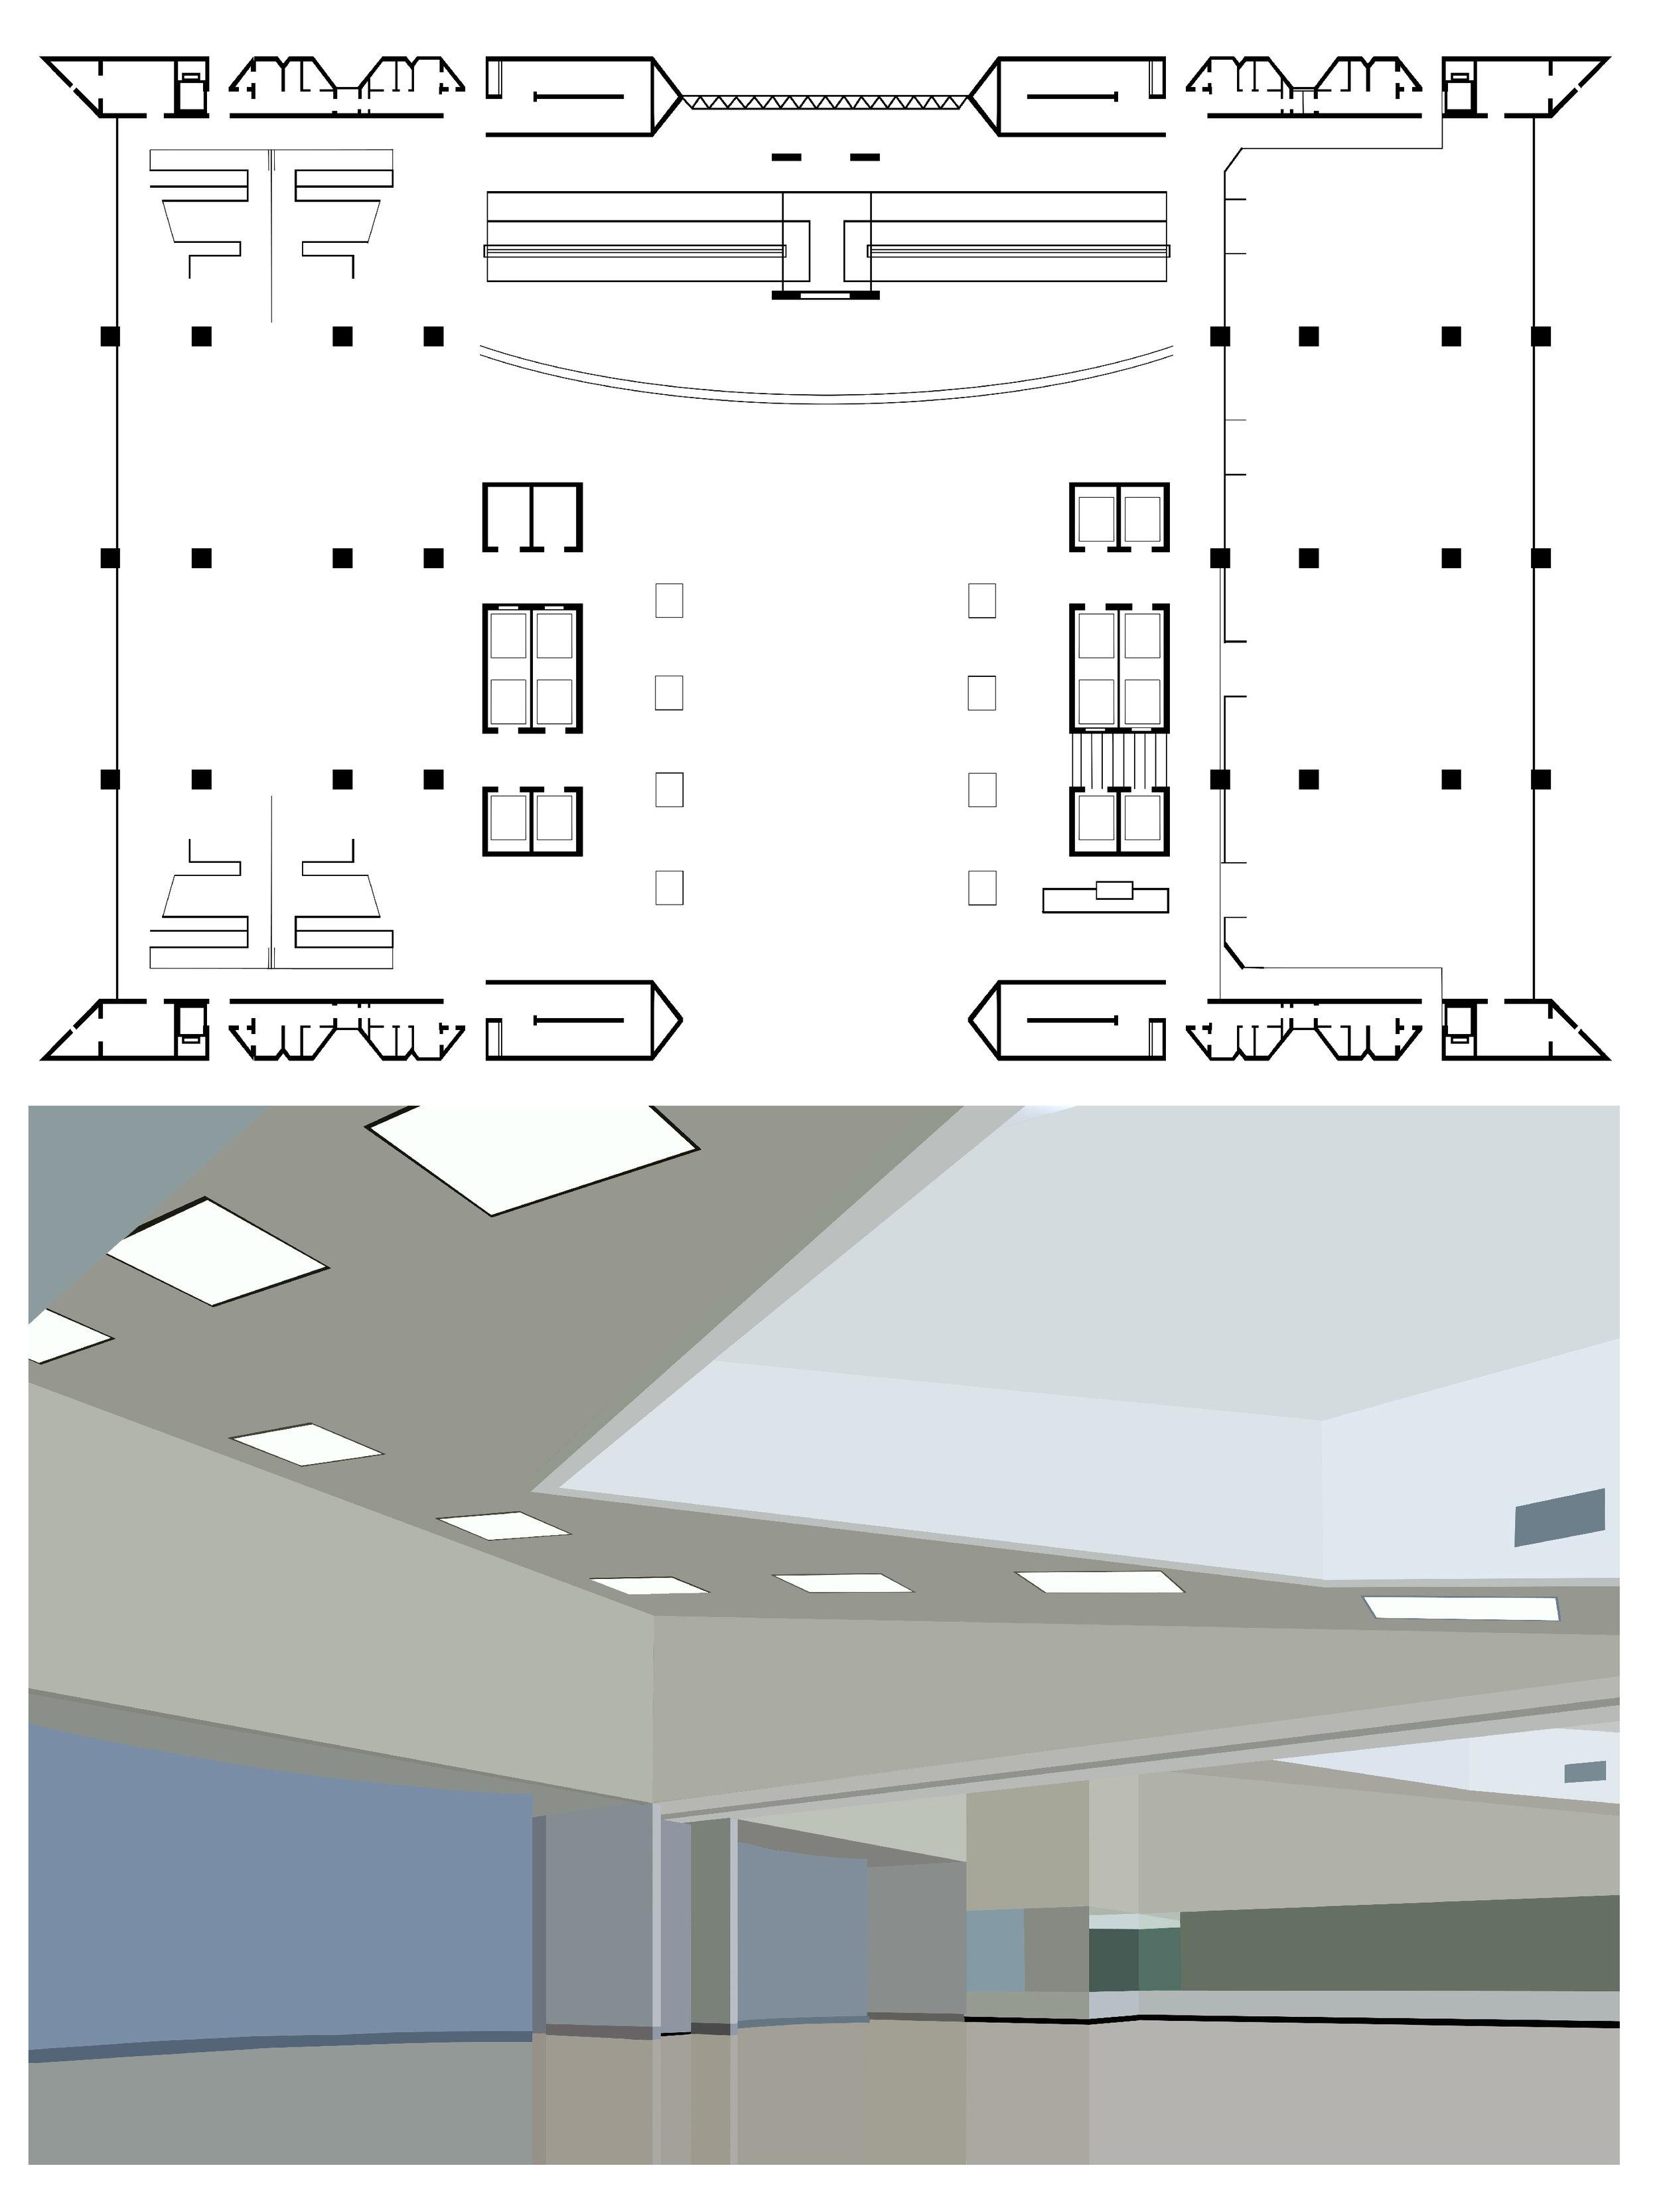 AEROBIC/YOGA STUDIO, U.S. AIRFORCE BASE